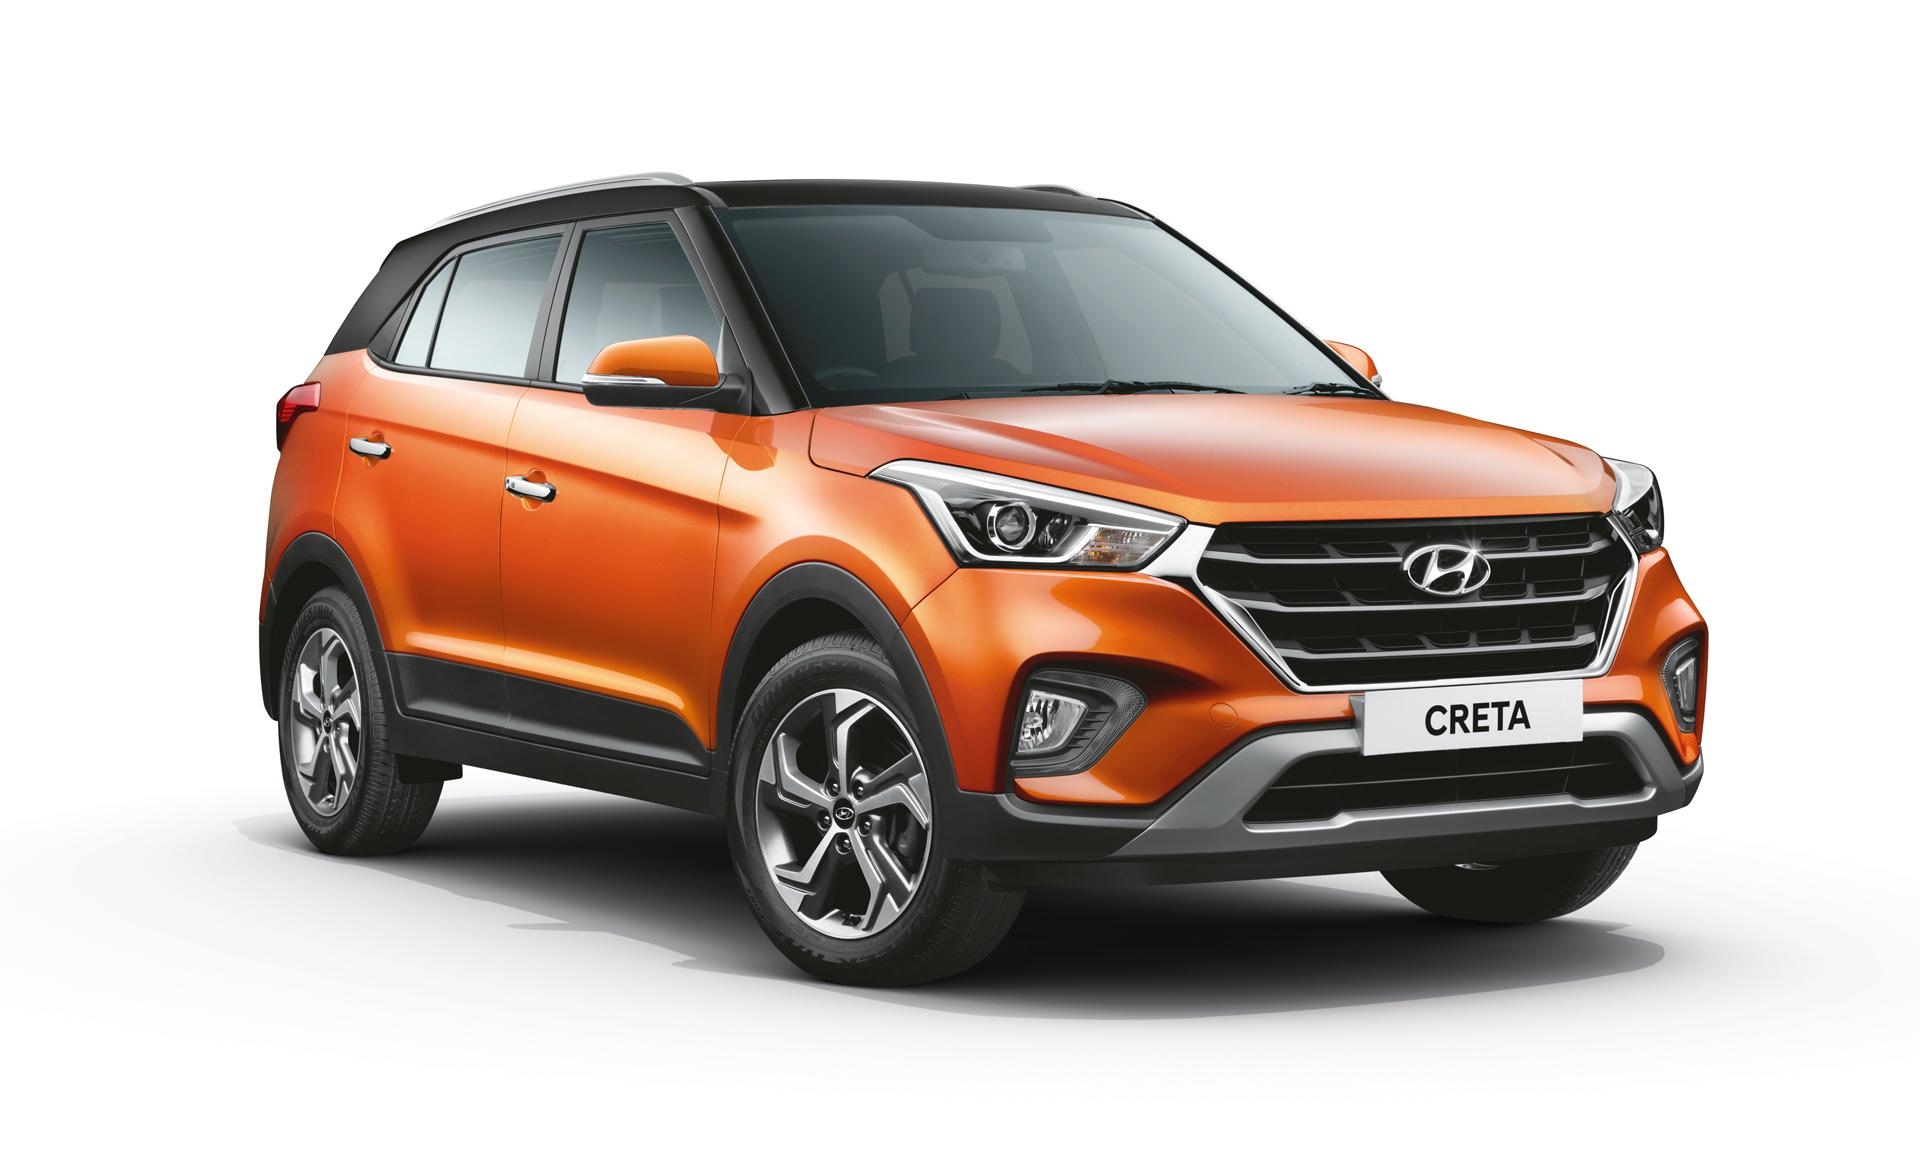 Hyundai Creta 2018 E Plus 1.6 Petrol Image